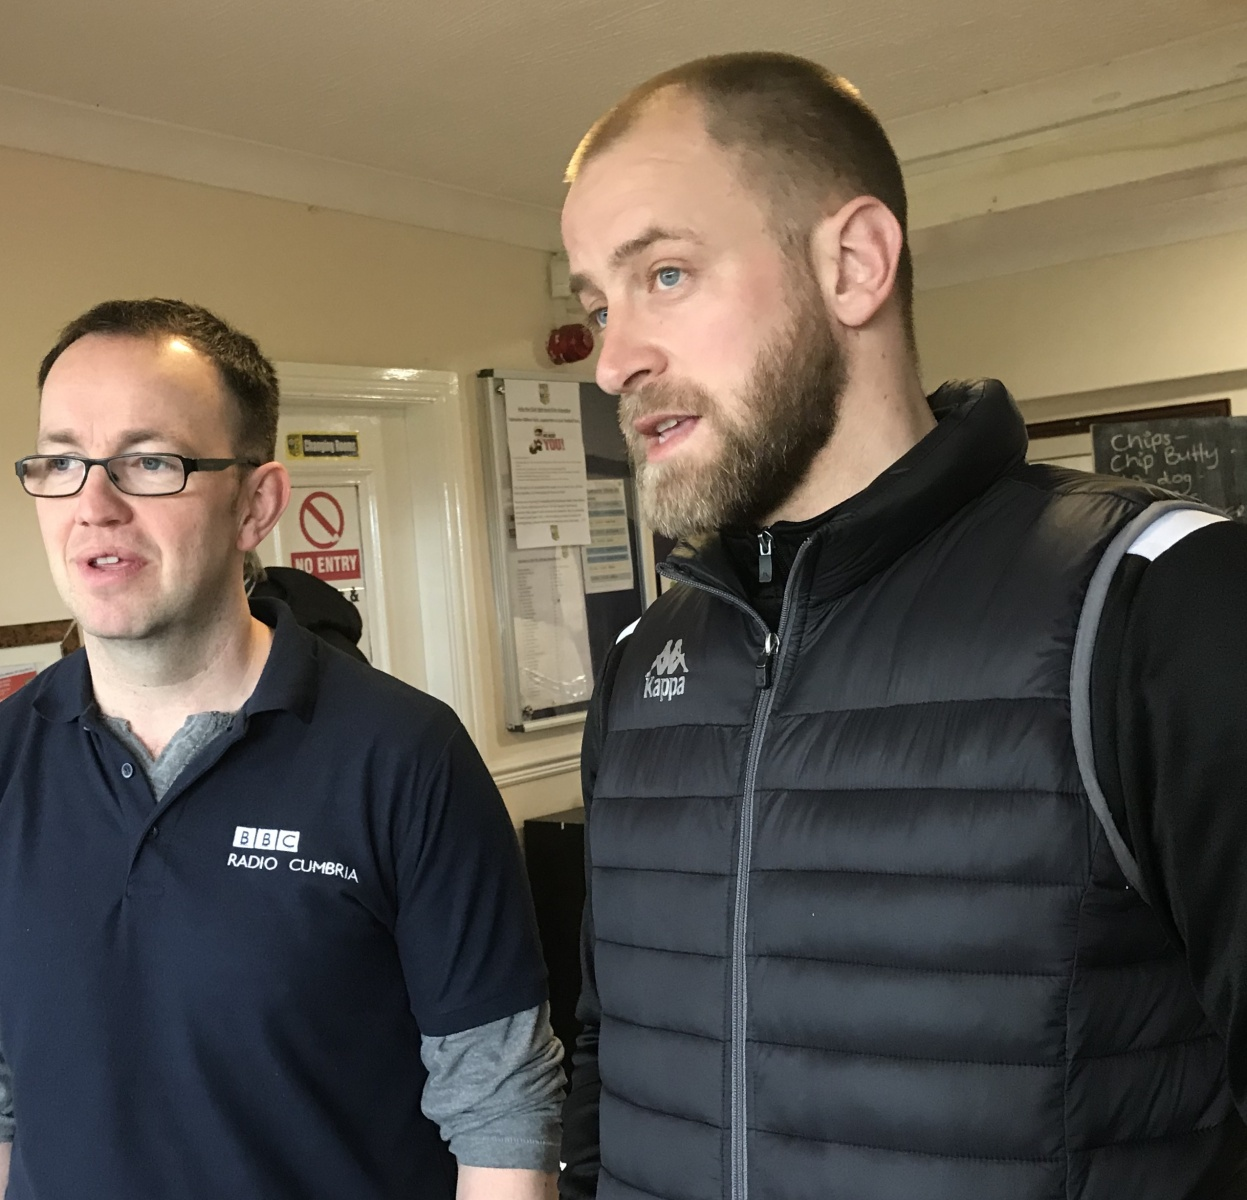 Tadcaster-Albion-BBC-Radio-Cumbrias-James-Phillips-and-Danny